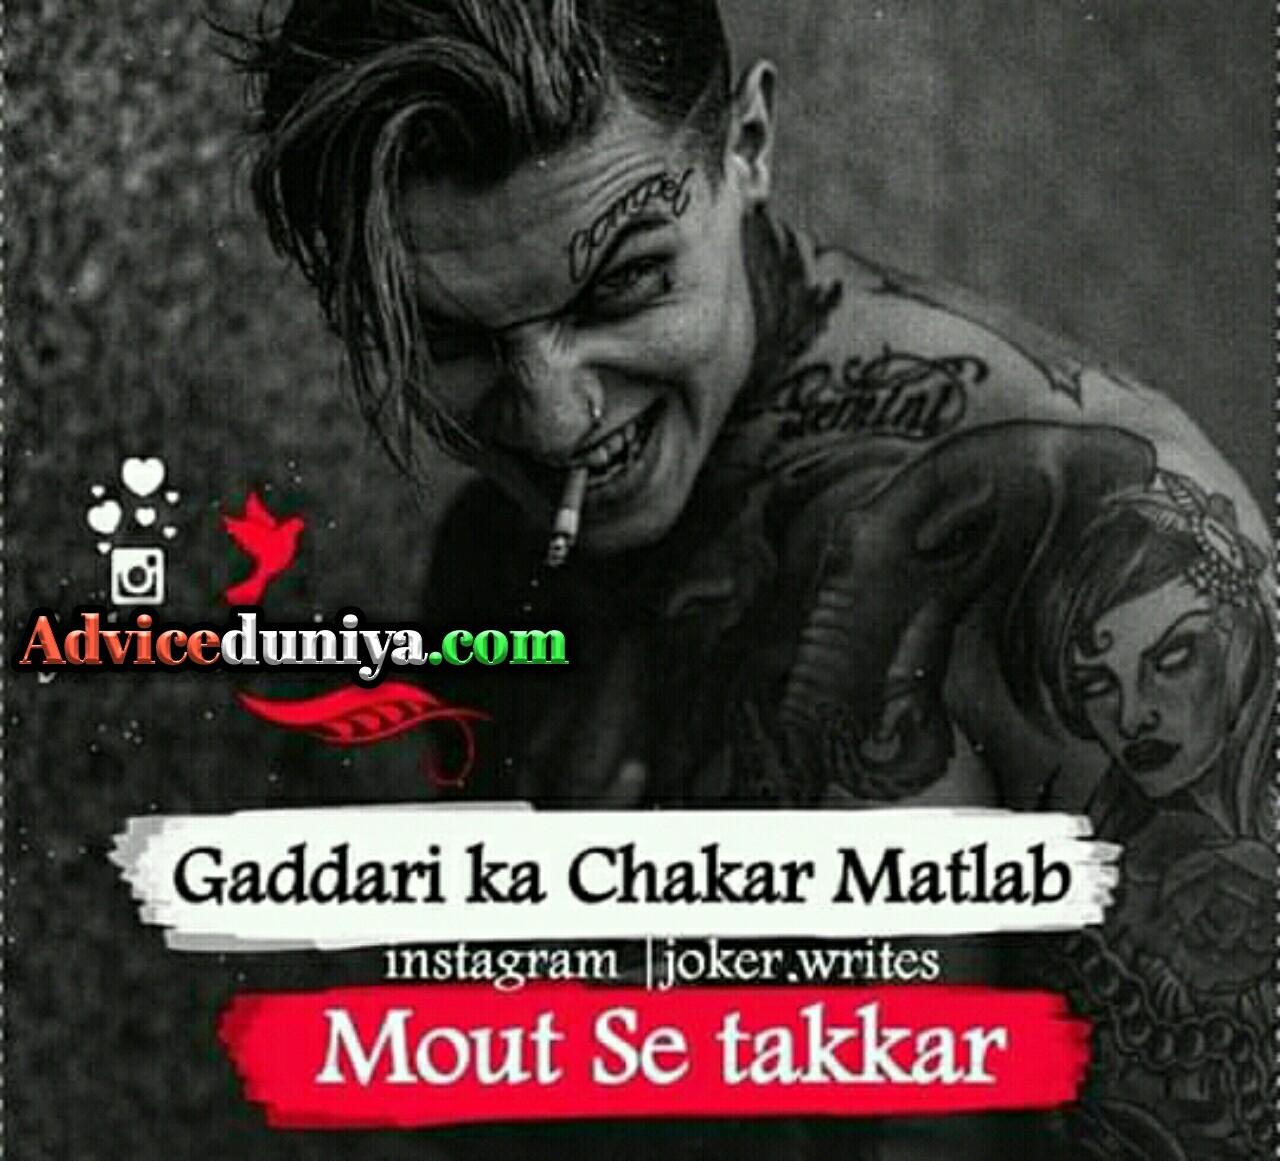 Royal whatsapp status in hindi